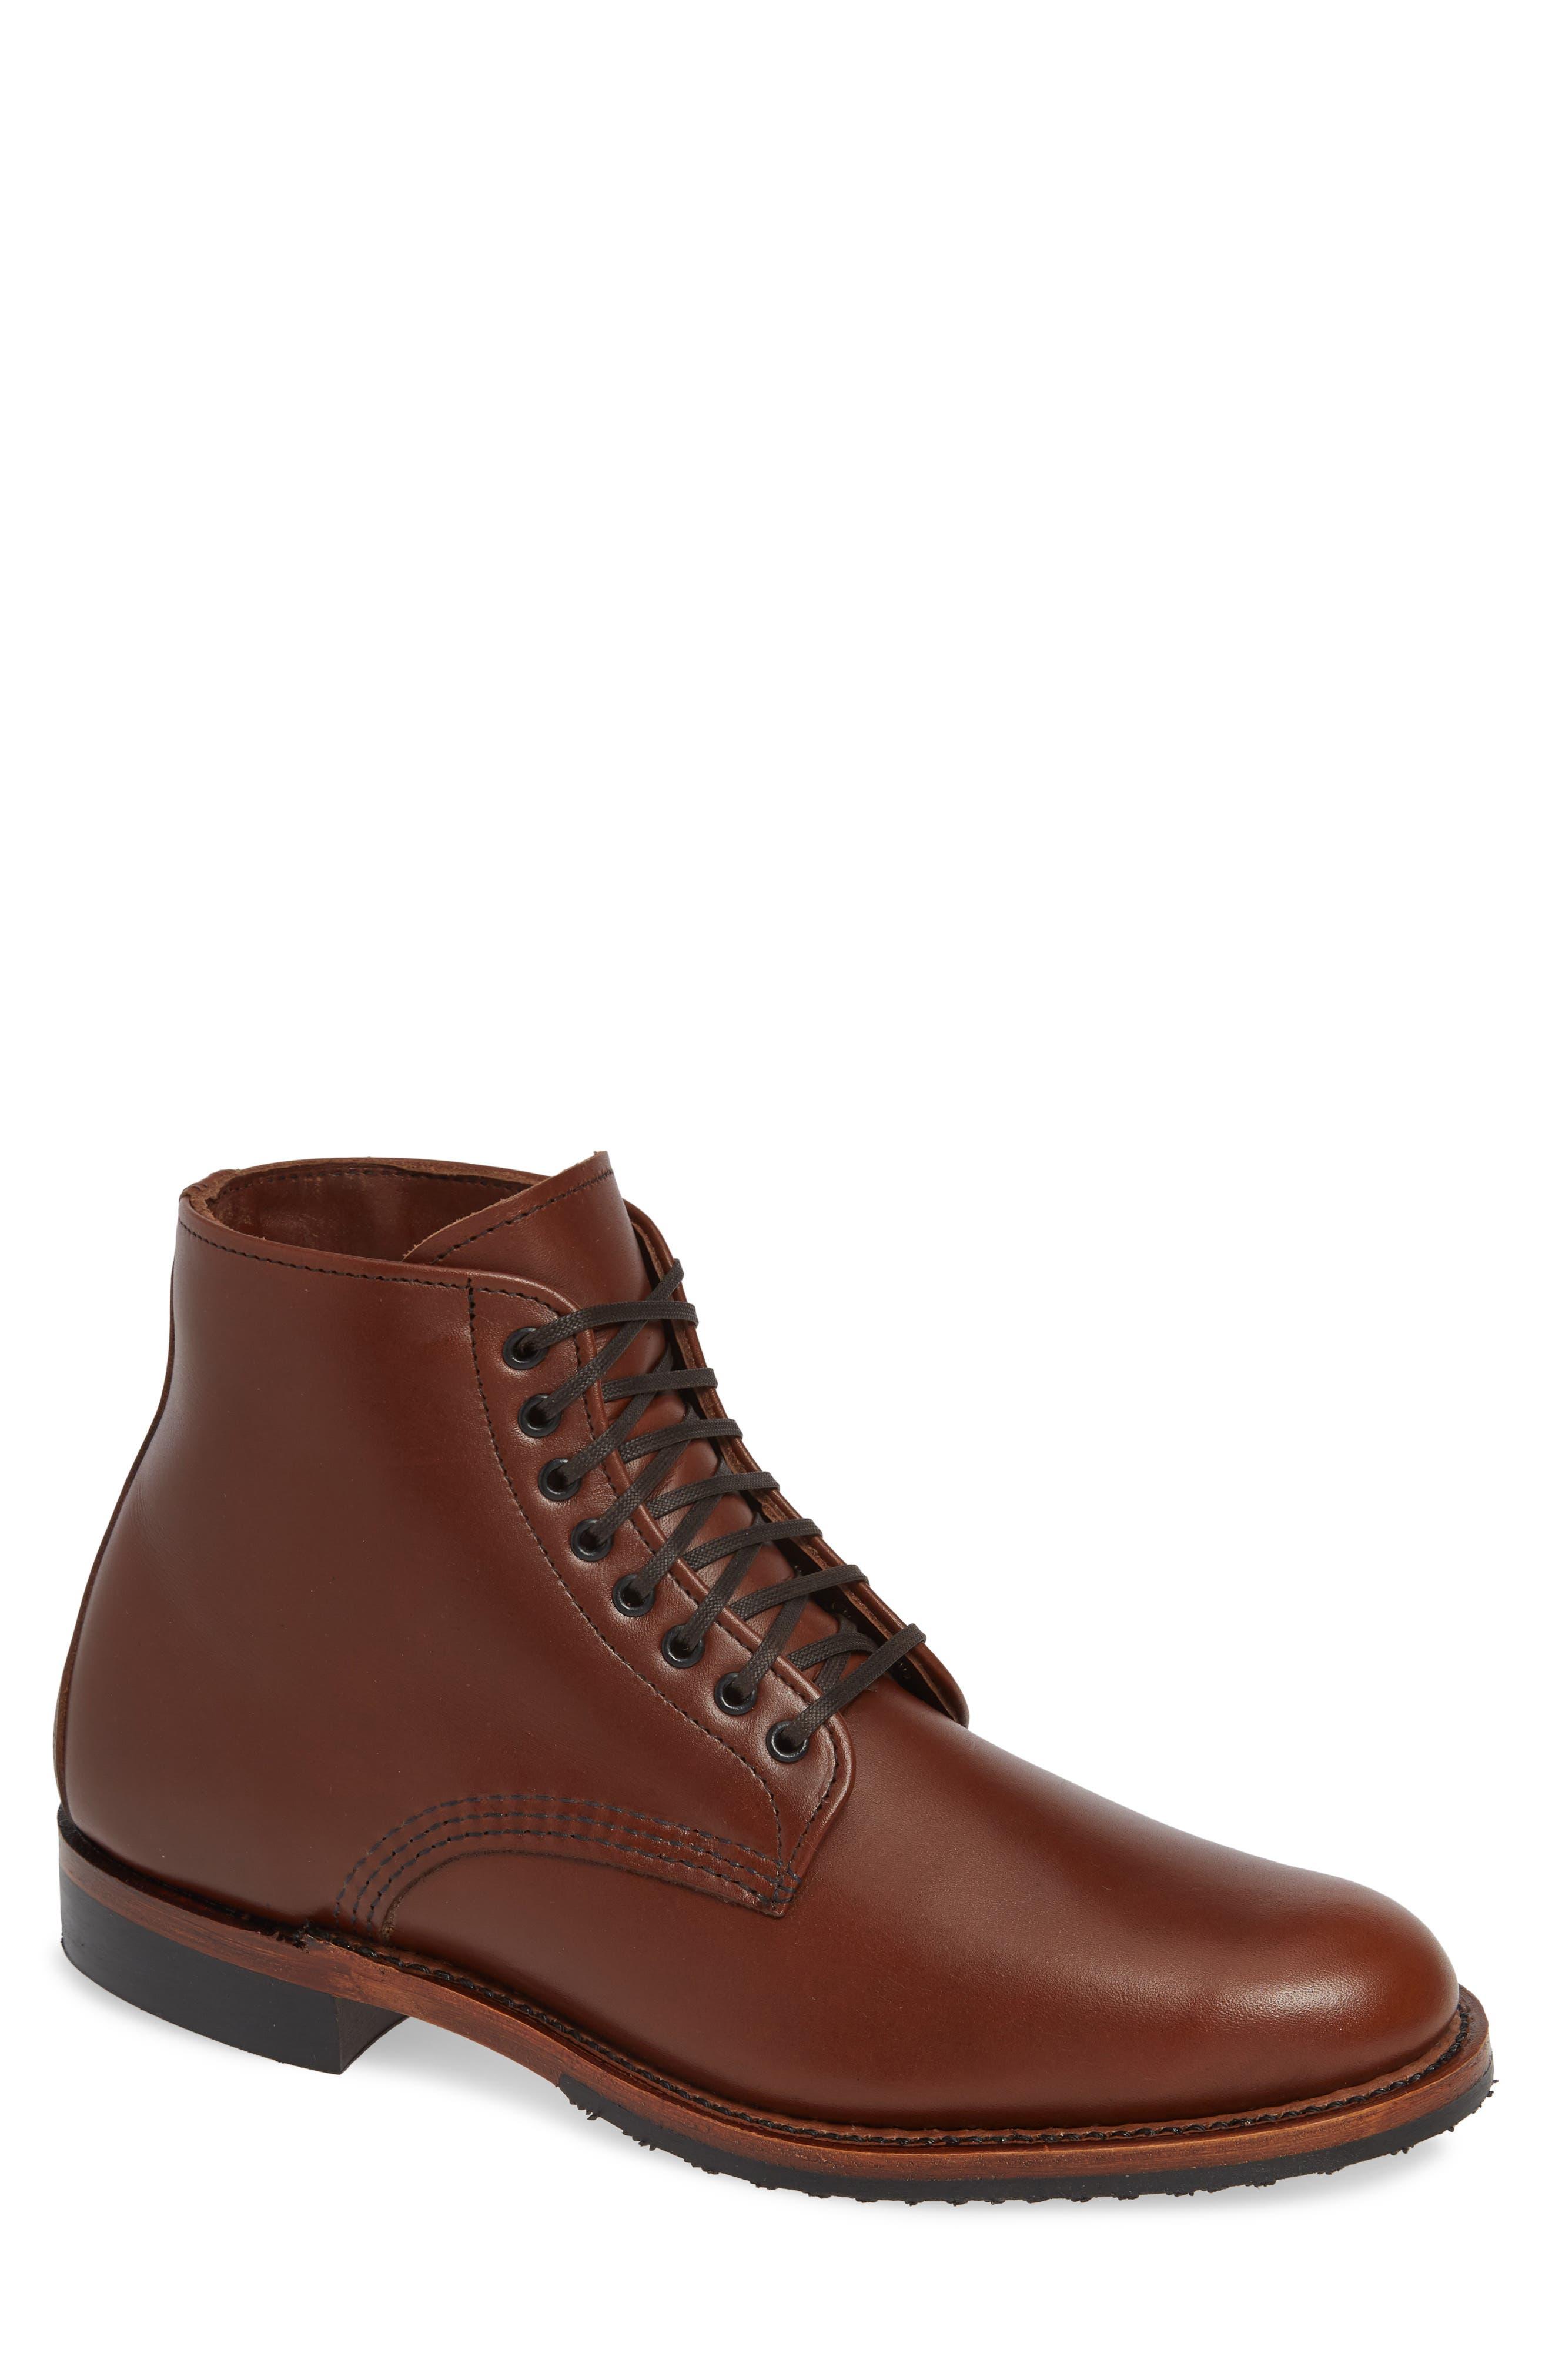 RED WING Williston Plain Toe Boot in Teak Leather